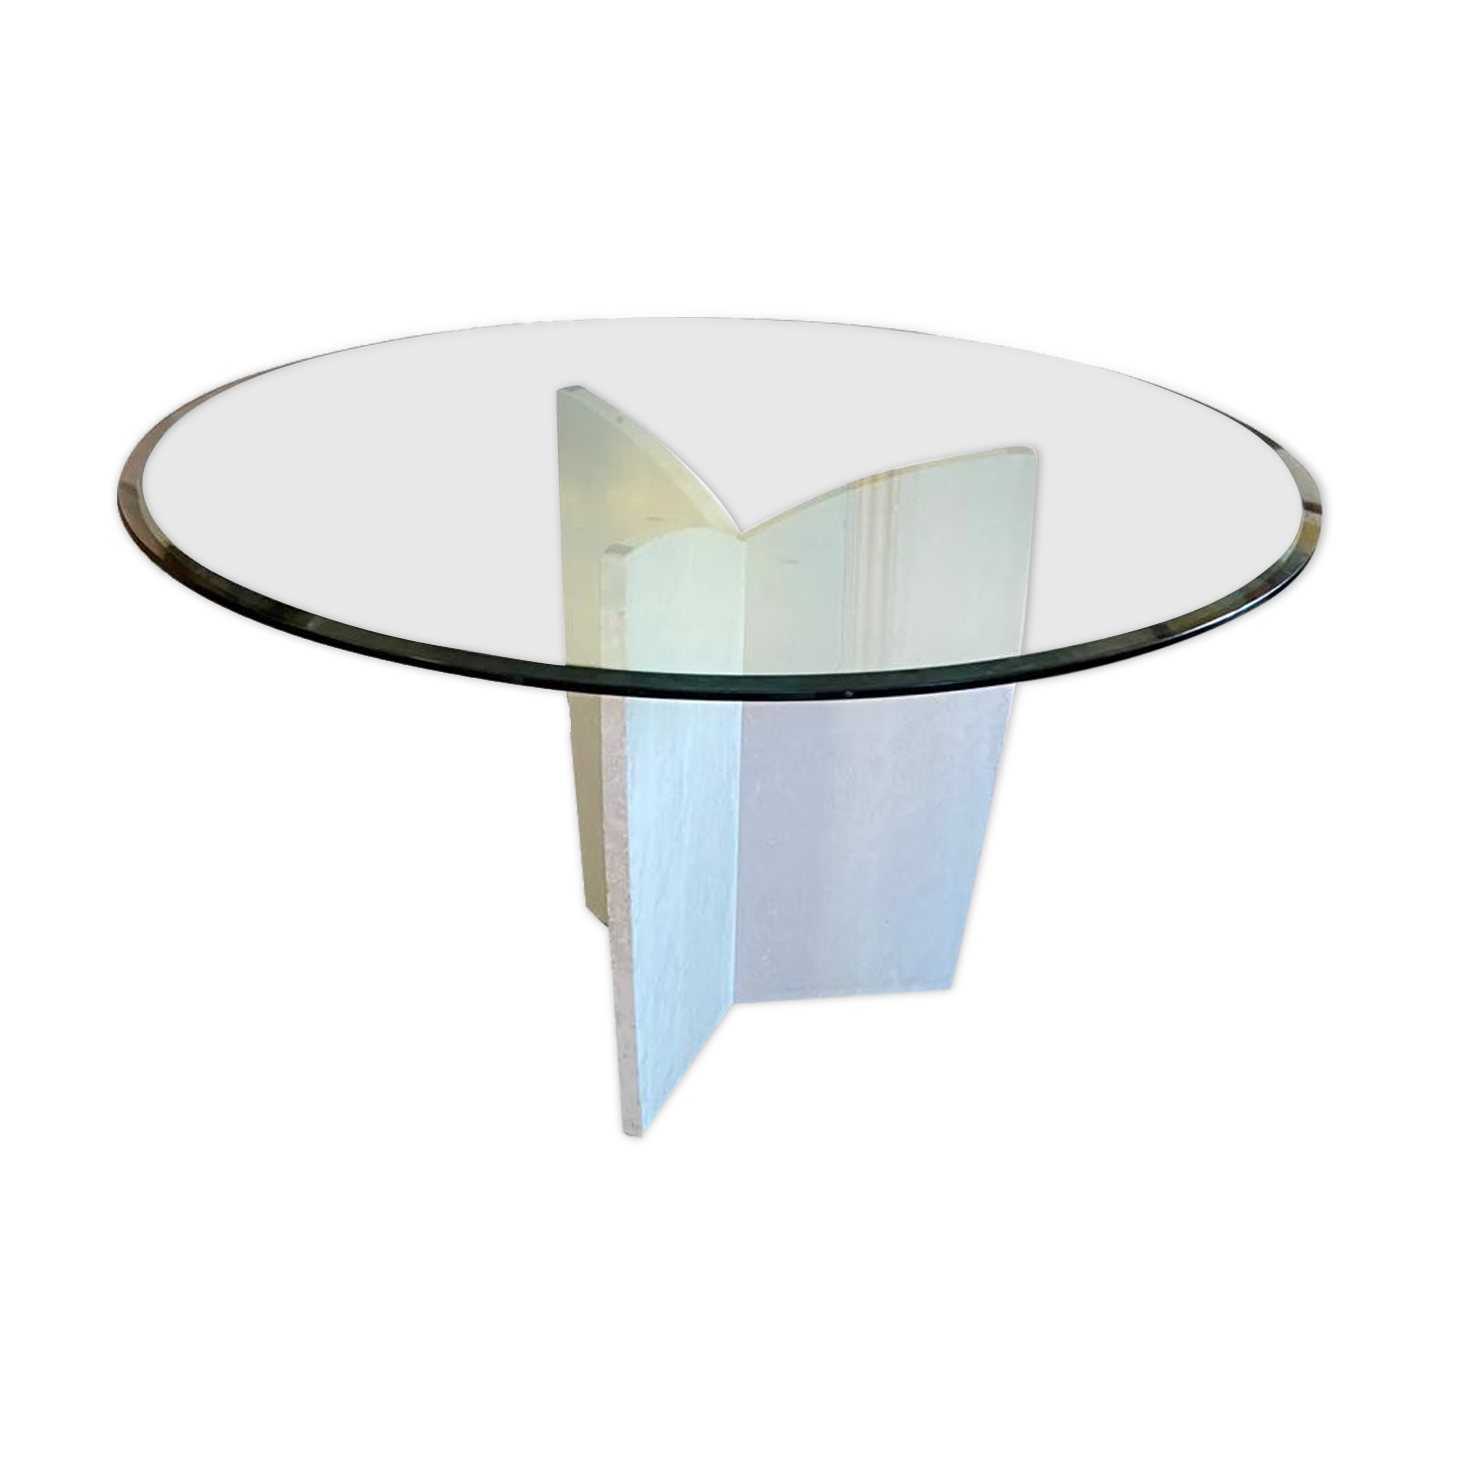 Table roche bobois plateau verre et pied travertin